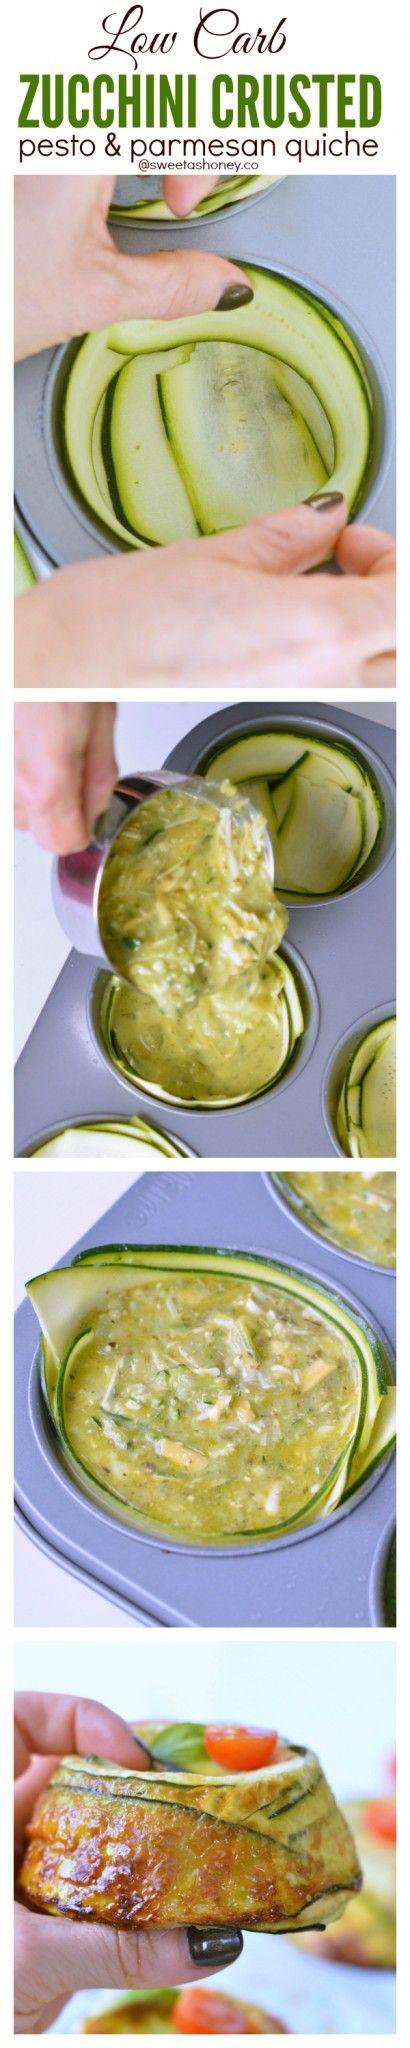 Zucchini Crustless quiche | low carb quiche recipes | clean eating quiche crustless